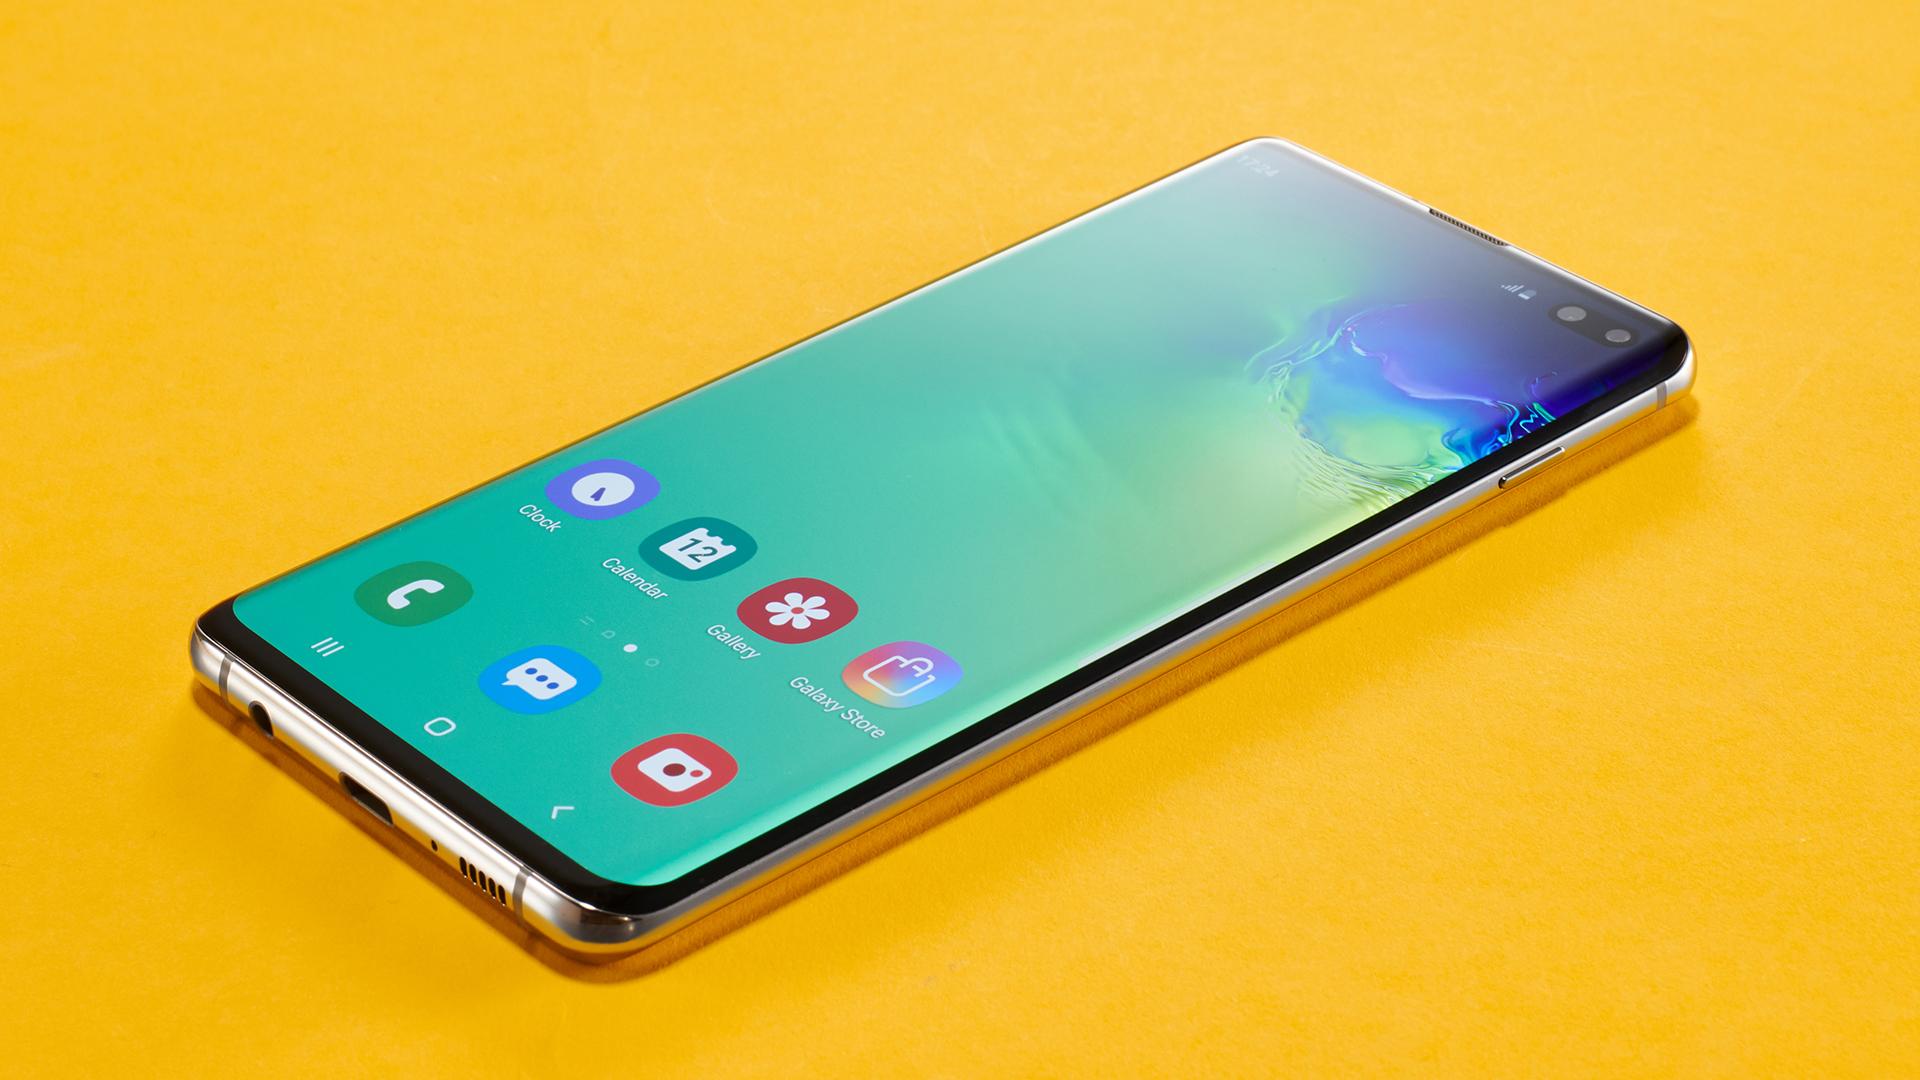 Samsung Galaxy S10 Samsung Galaxy S10 Plus 1920x1080 Wallpaper Teahub Io